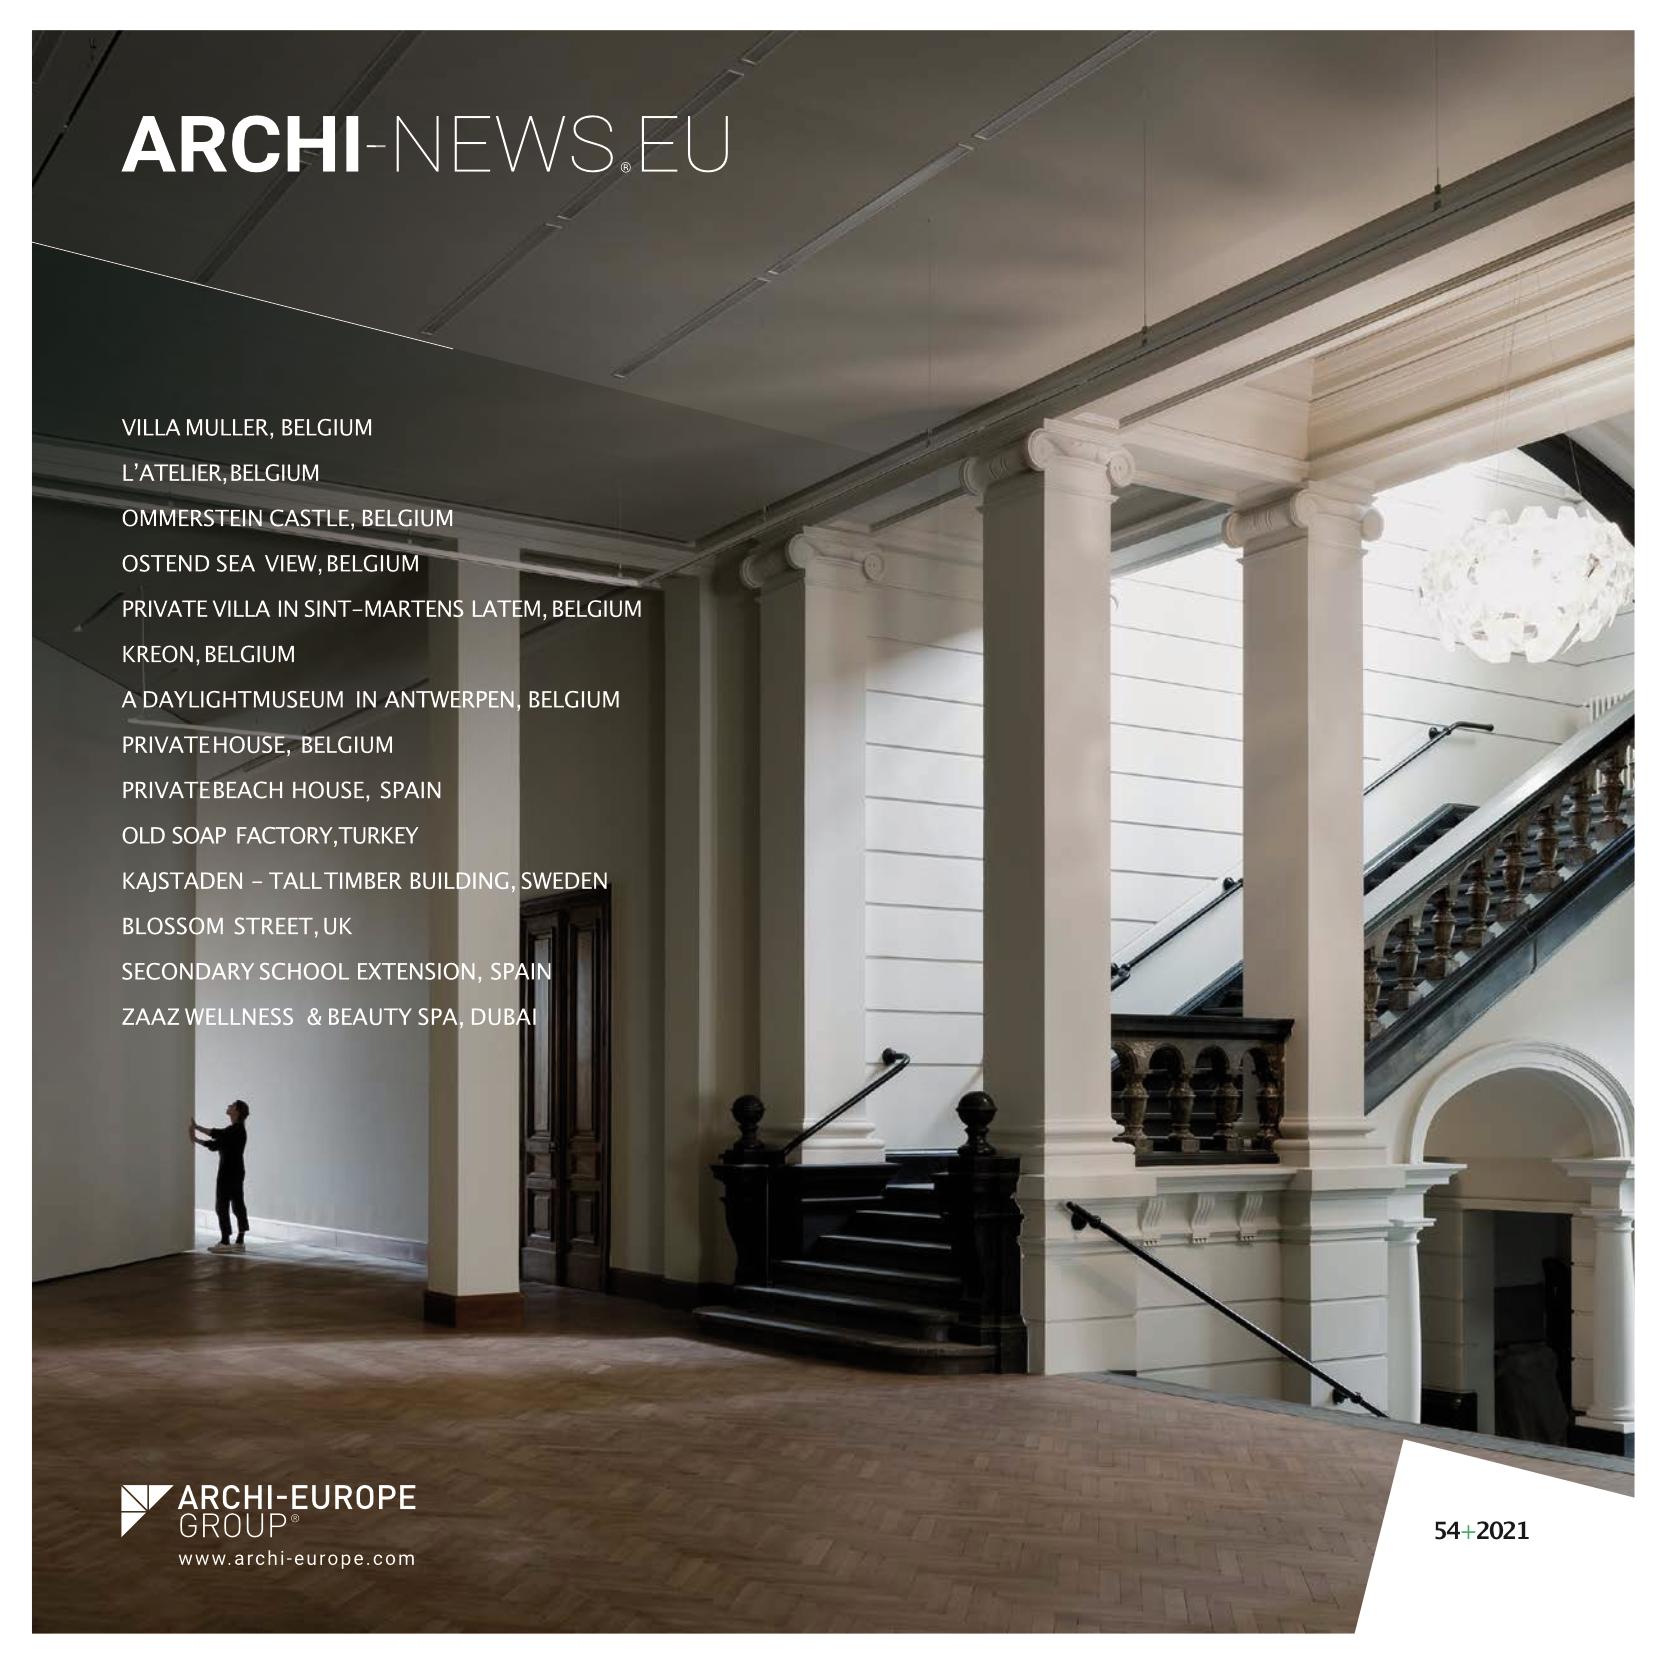 ANP 054 jun 2021 coverpage